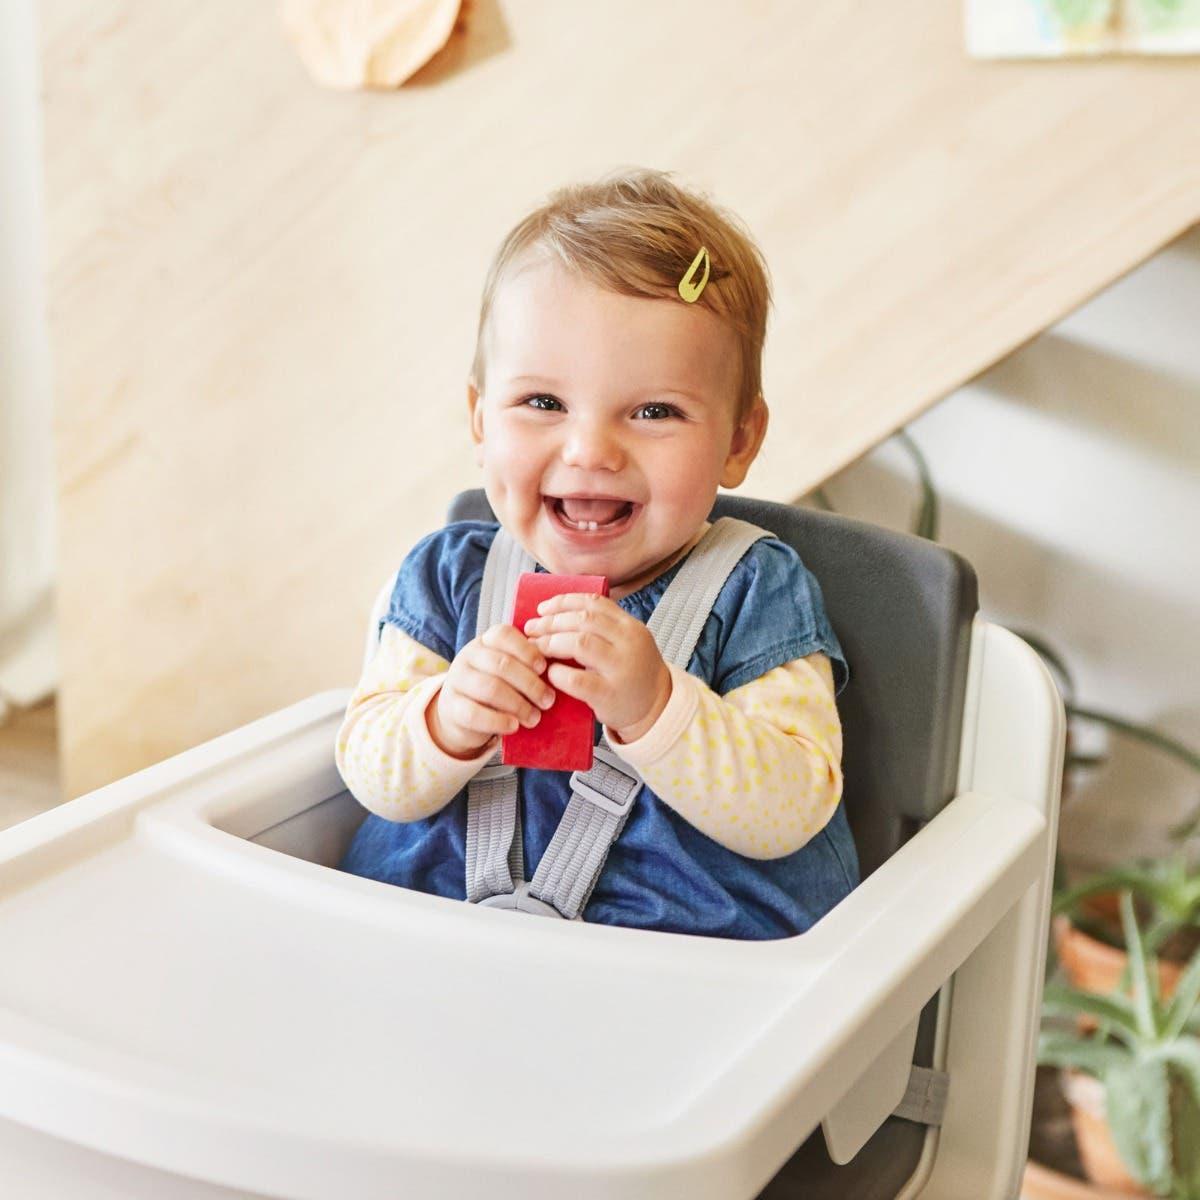 Baby sitting in Nuna ZAAZ™ high chair